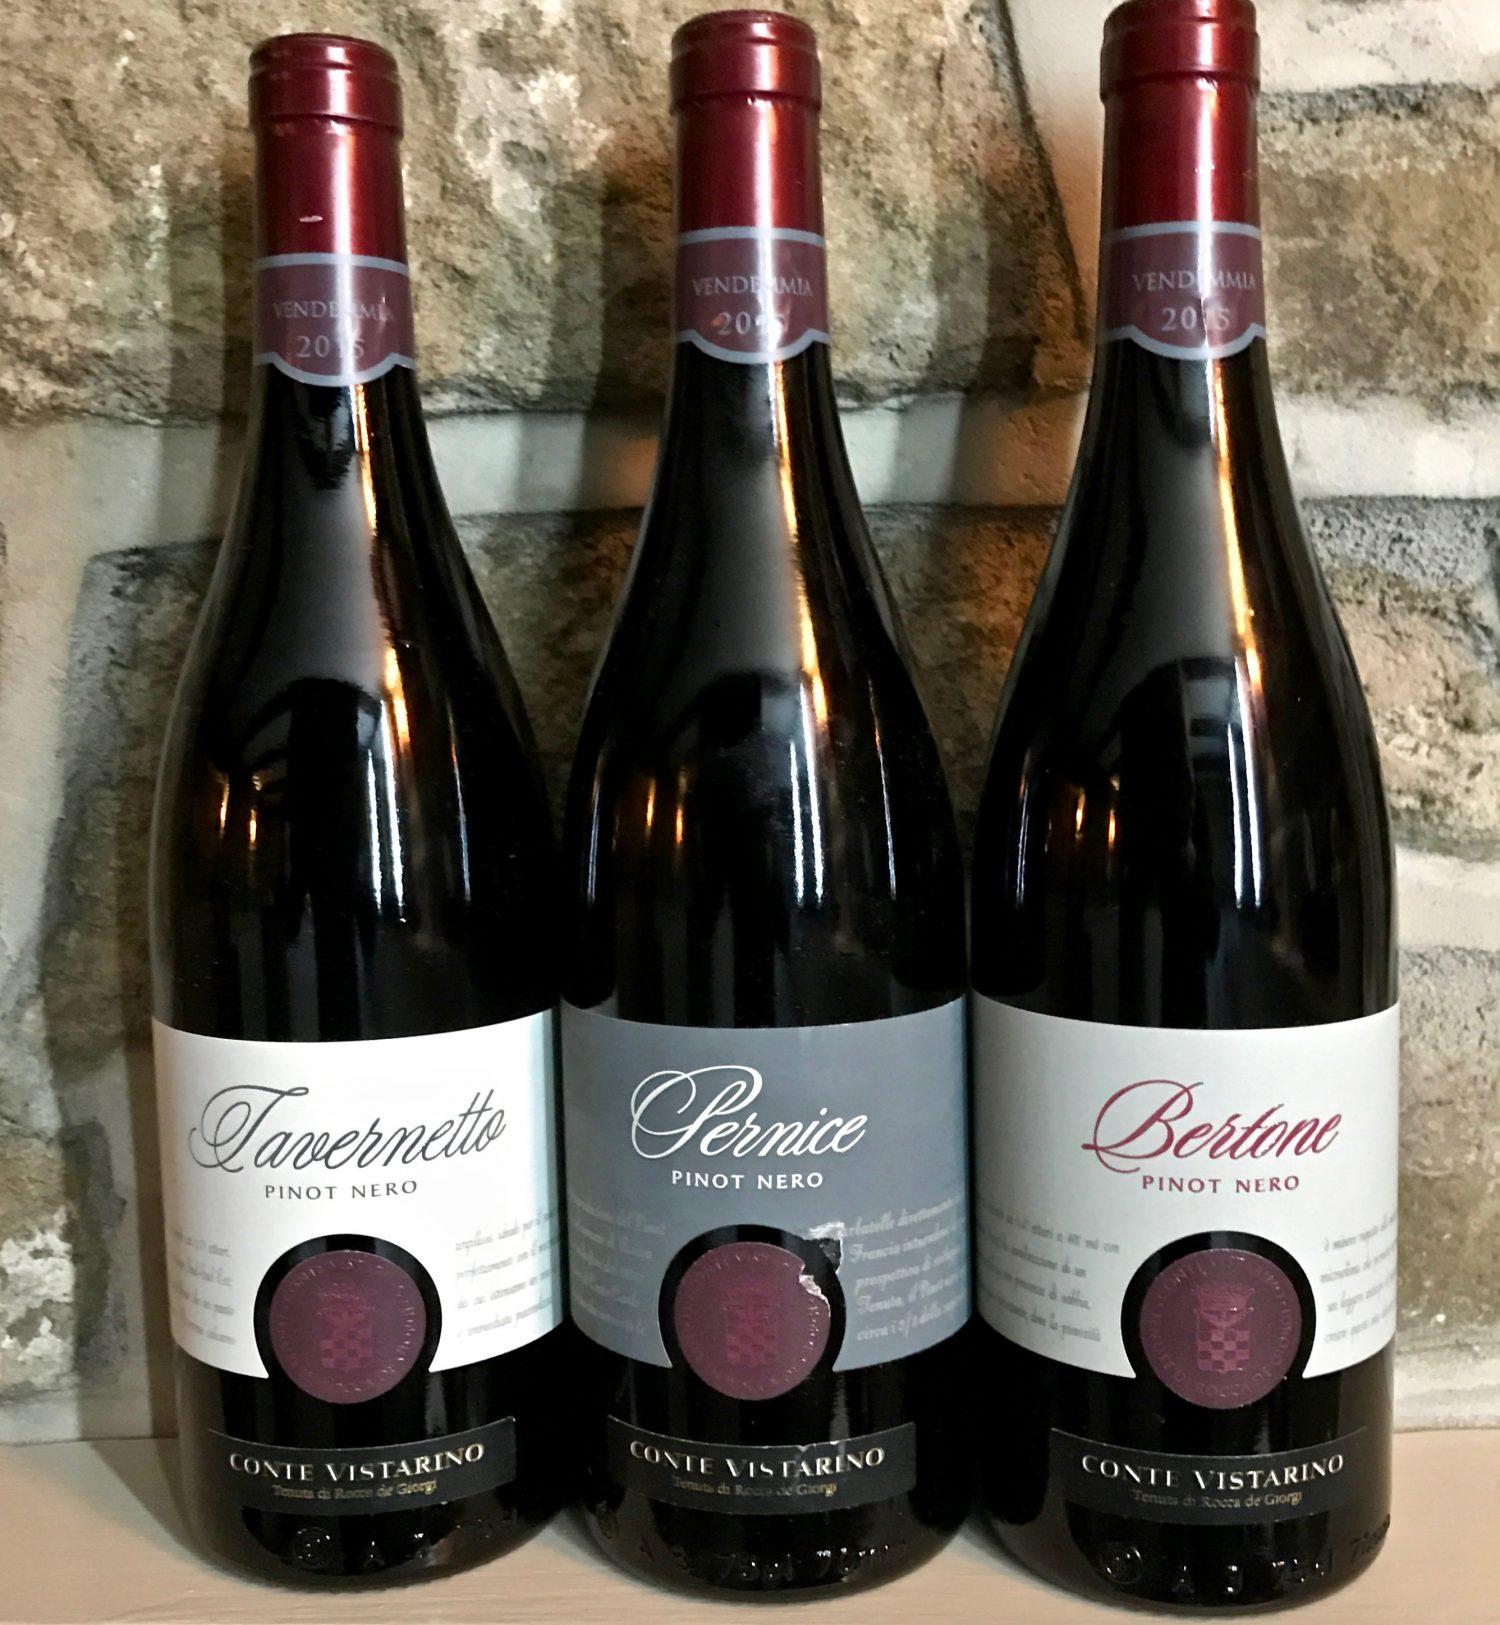 Conte Vistarino Pinot Nero